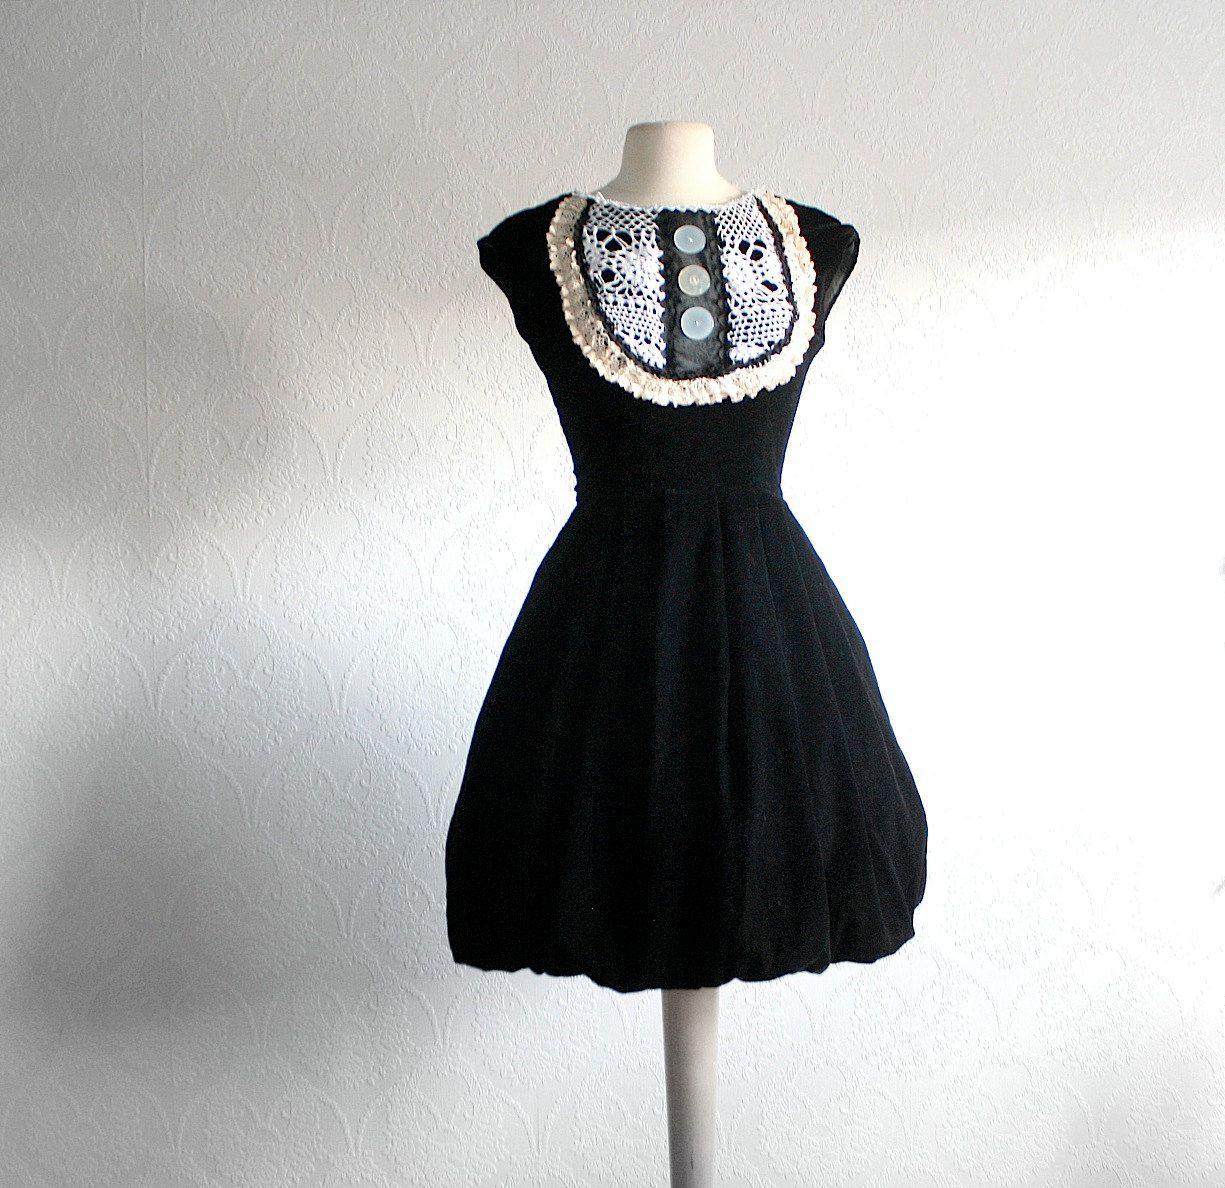 Upcycled vintage black velvet dress pinups u outfits pinterest